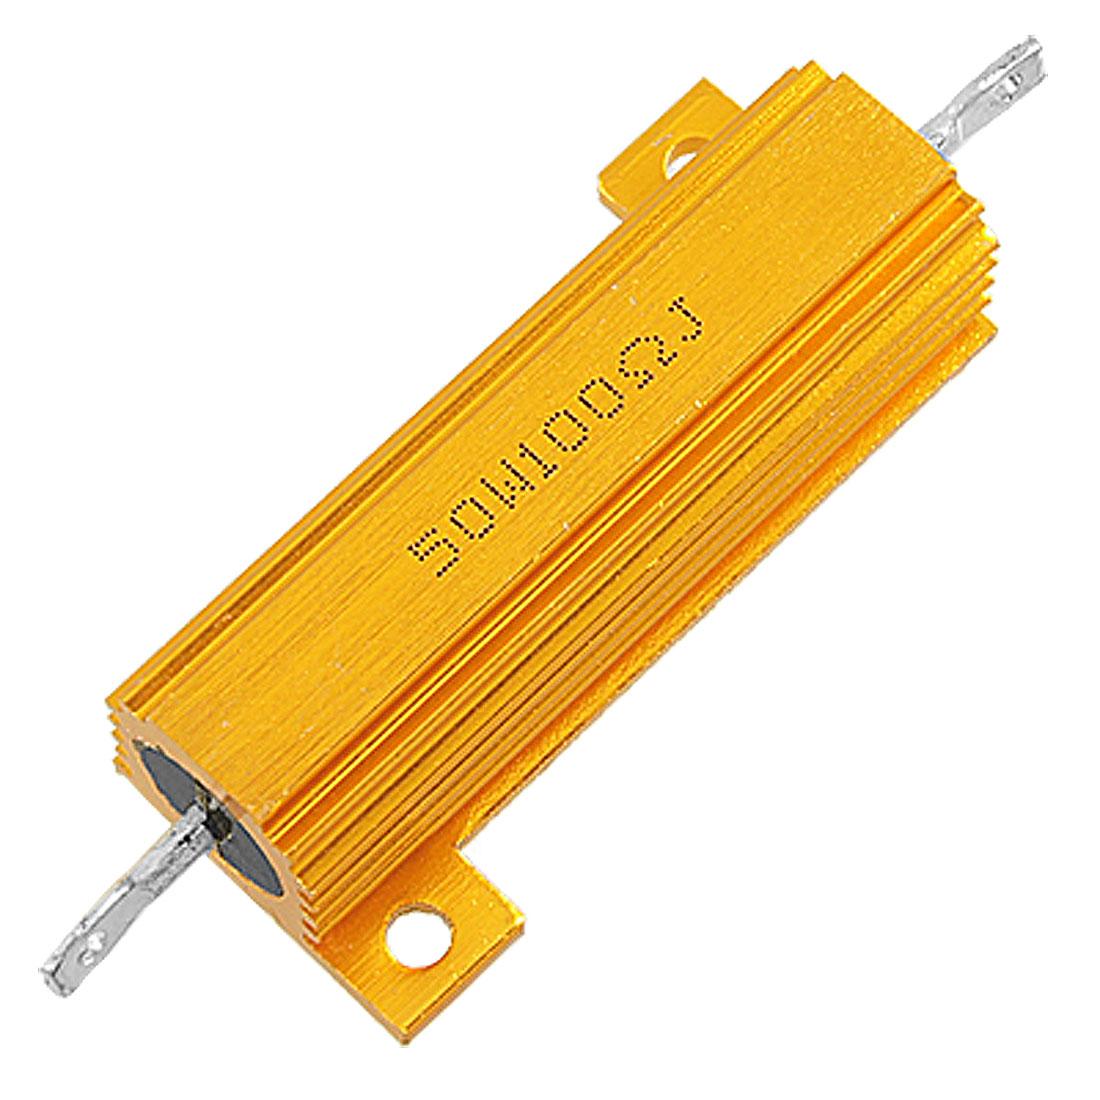 100 Ohm 5% 50W Screw Tab Aluminium Clad Wirewound Resistor Gold Tone